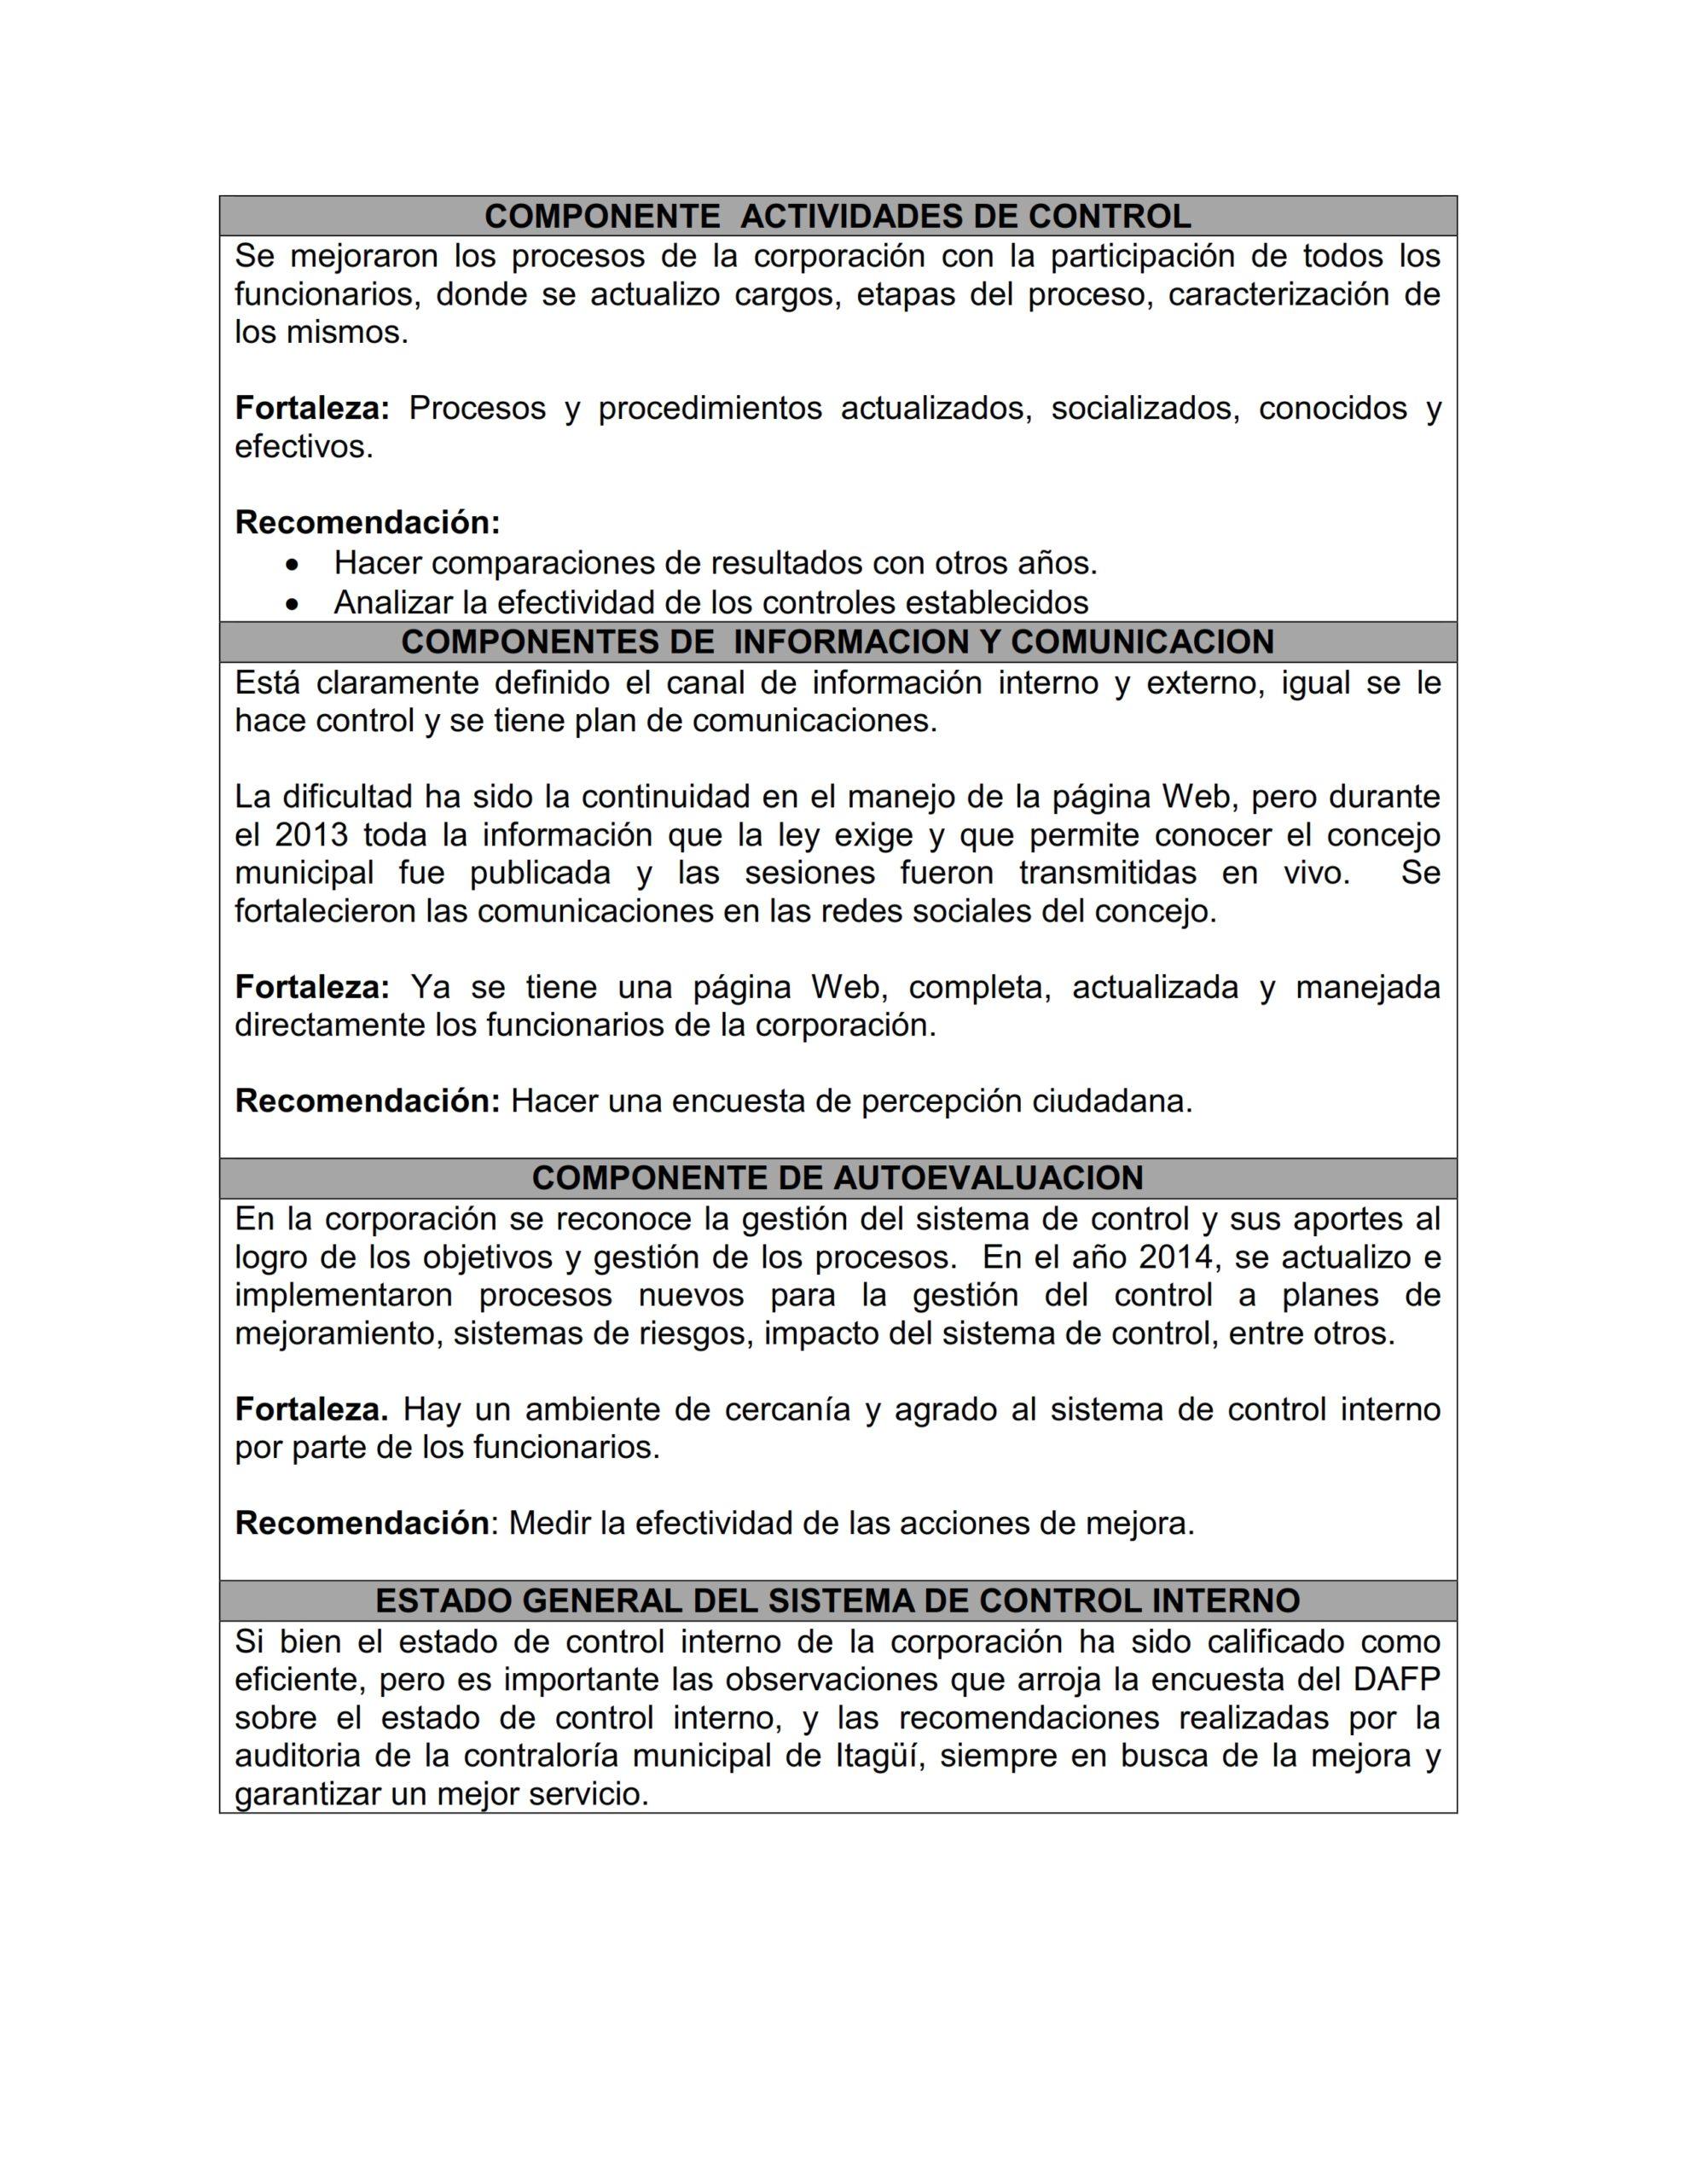 https://concejodeitagui.gov.co/wp-content/uploads/2020/11/2014_segundoinforme2-scaled.jpg